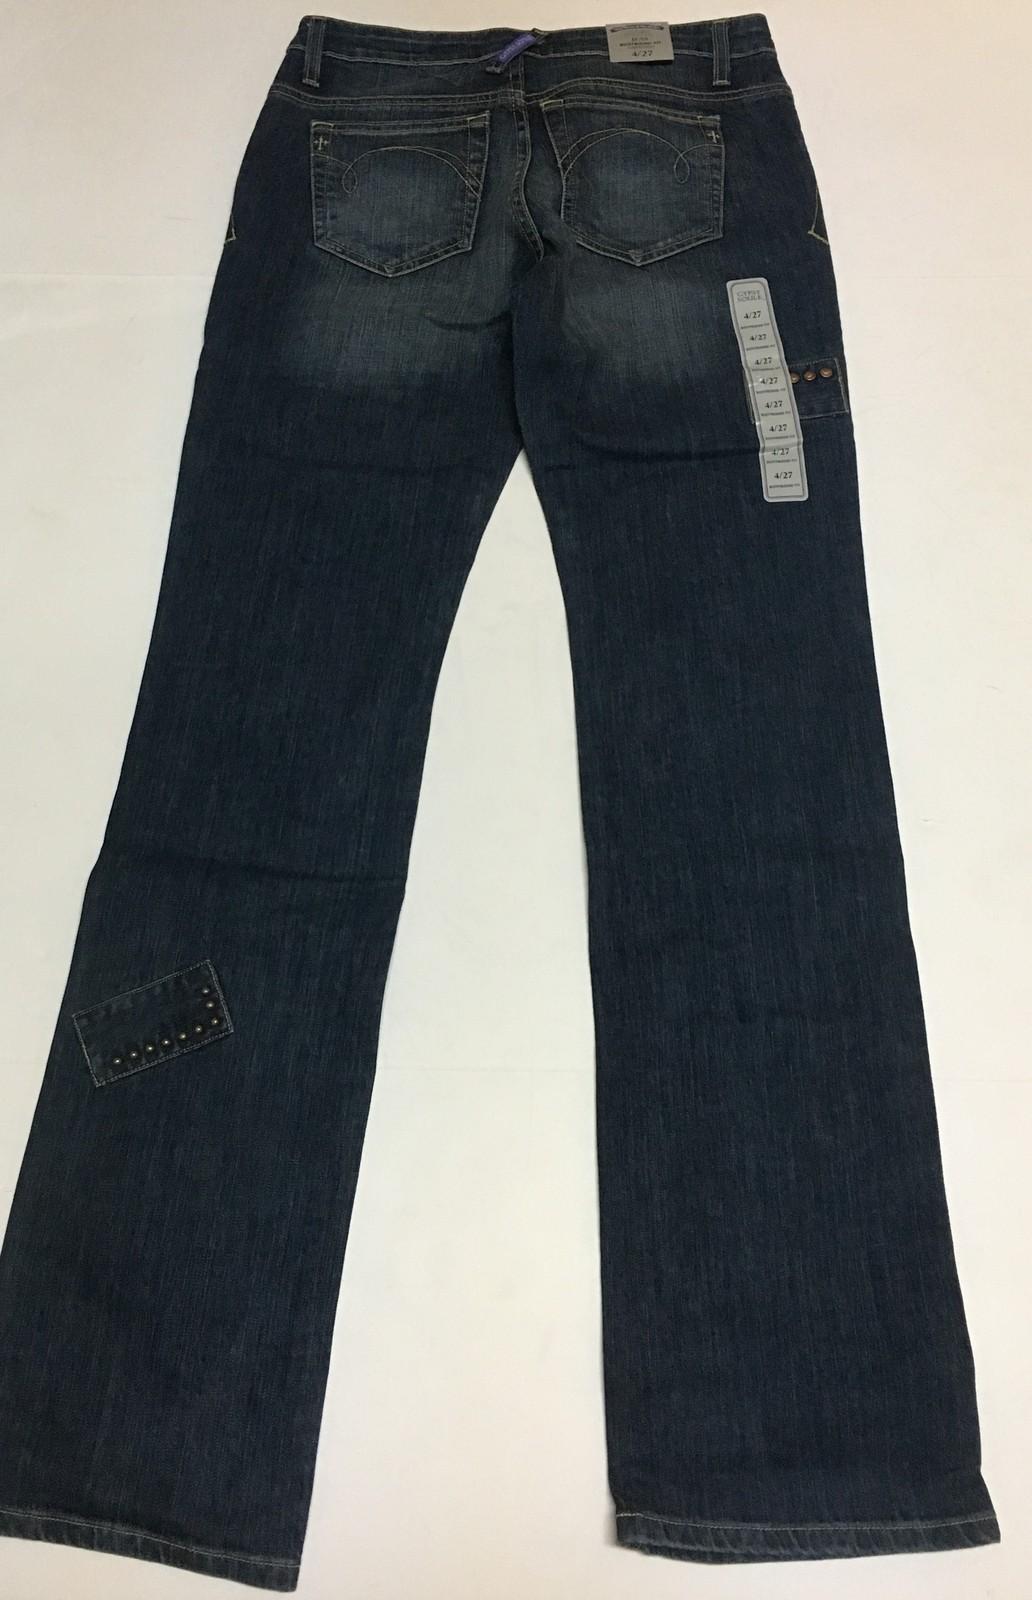 Women's Gypsy Soule Boyfriend Blue Jeans Jess Stretch Sz 28, 30, 34 Waist image 5